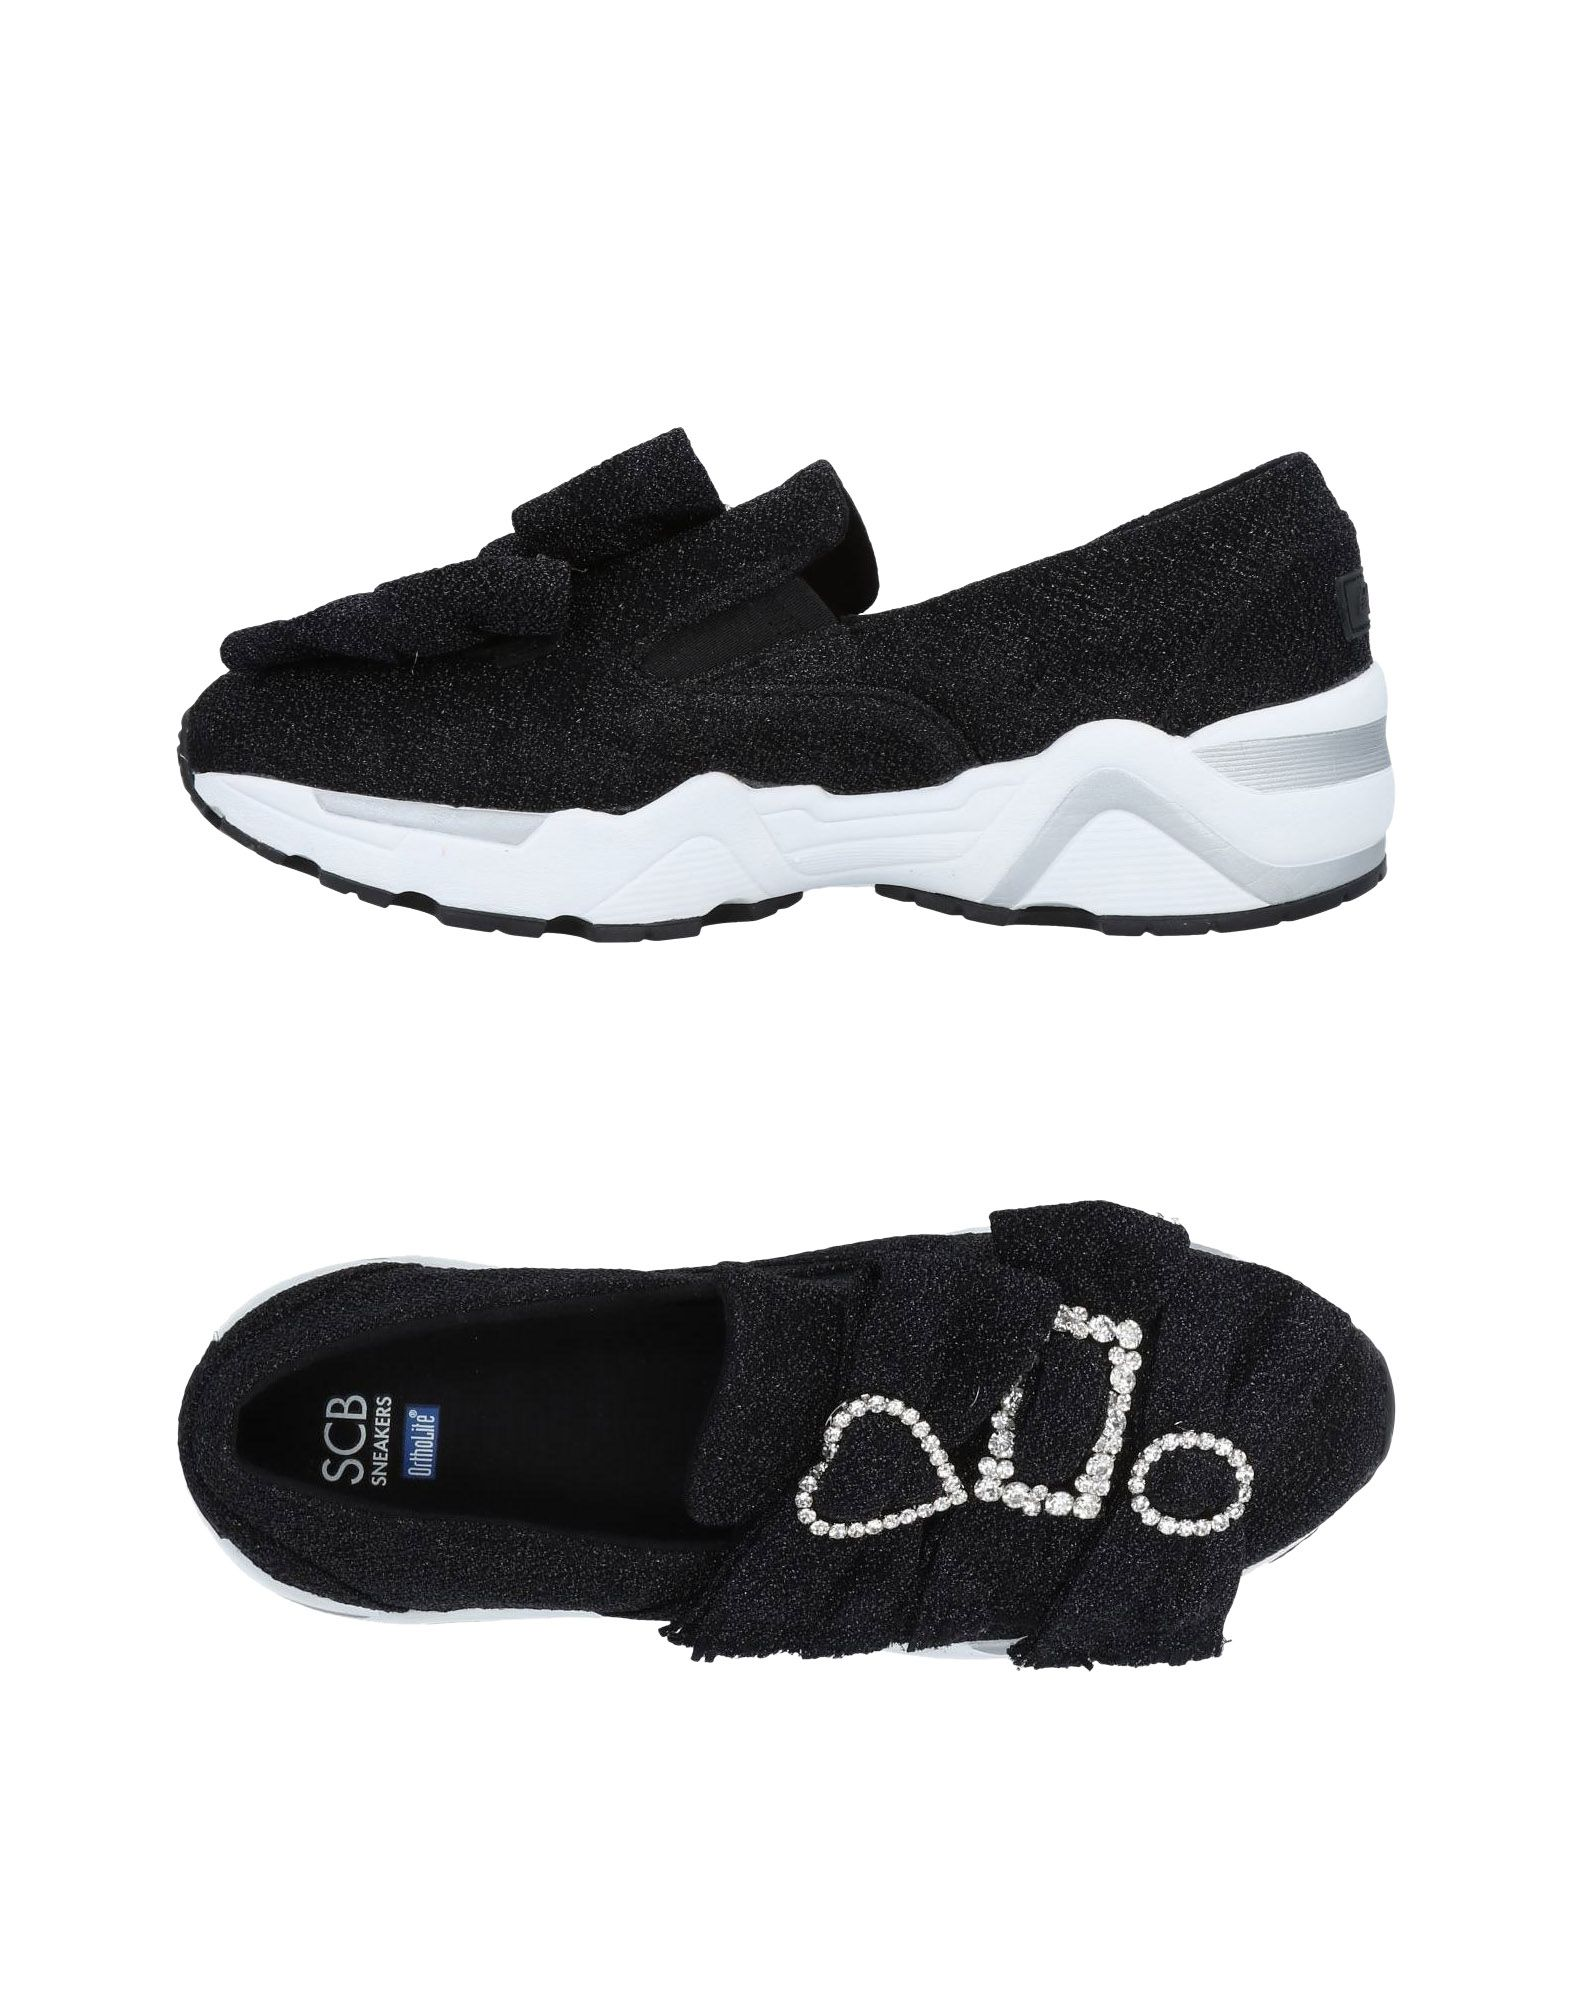 Suecomma  Bonnie Sneakers Damen  Suecomma 11482513GHGut aussehende strapazierfähige Schuhe b671f7